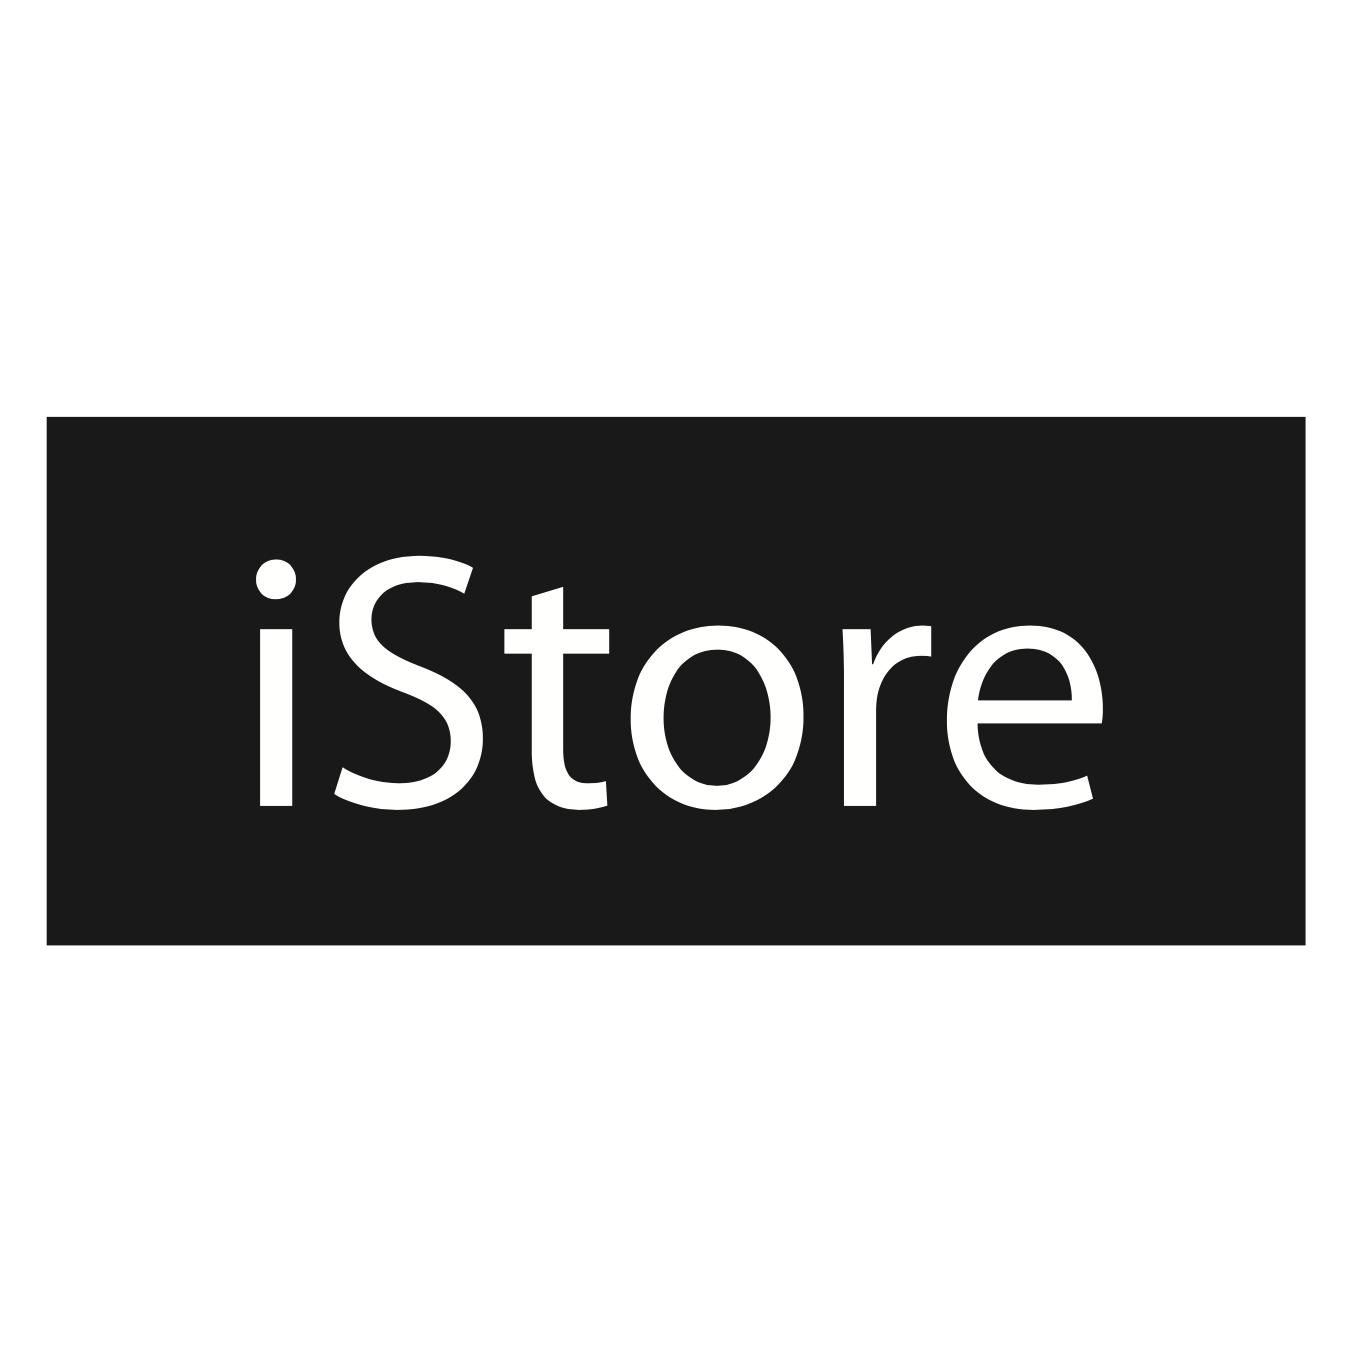 iPhone 6 32GB - Space Grey